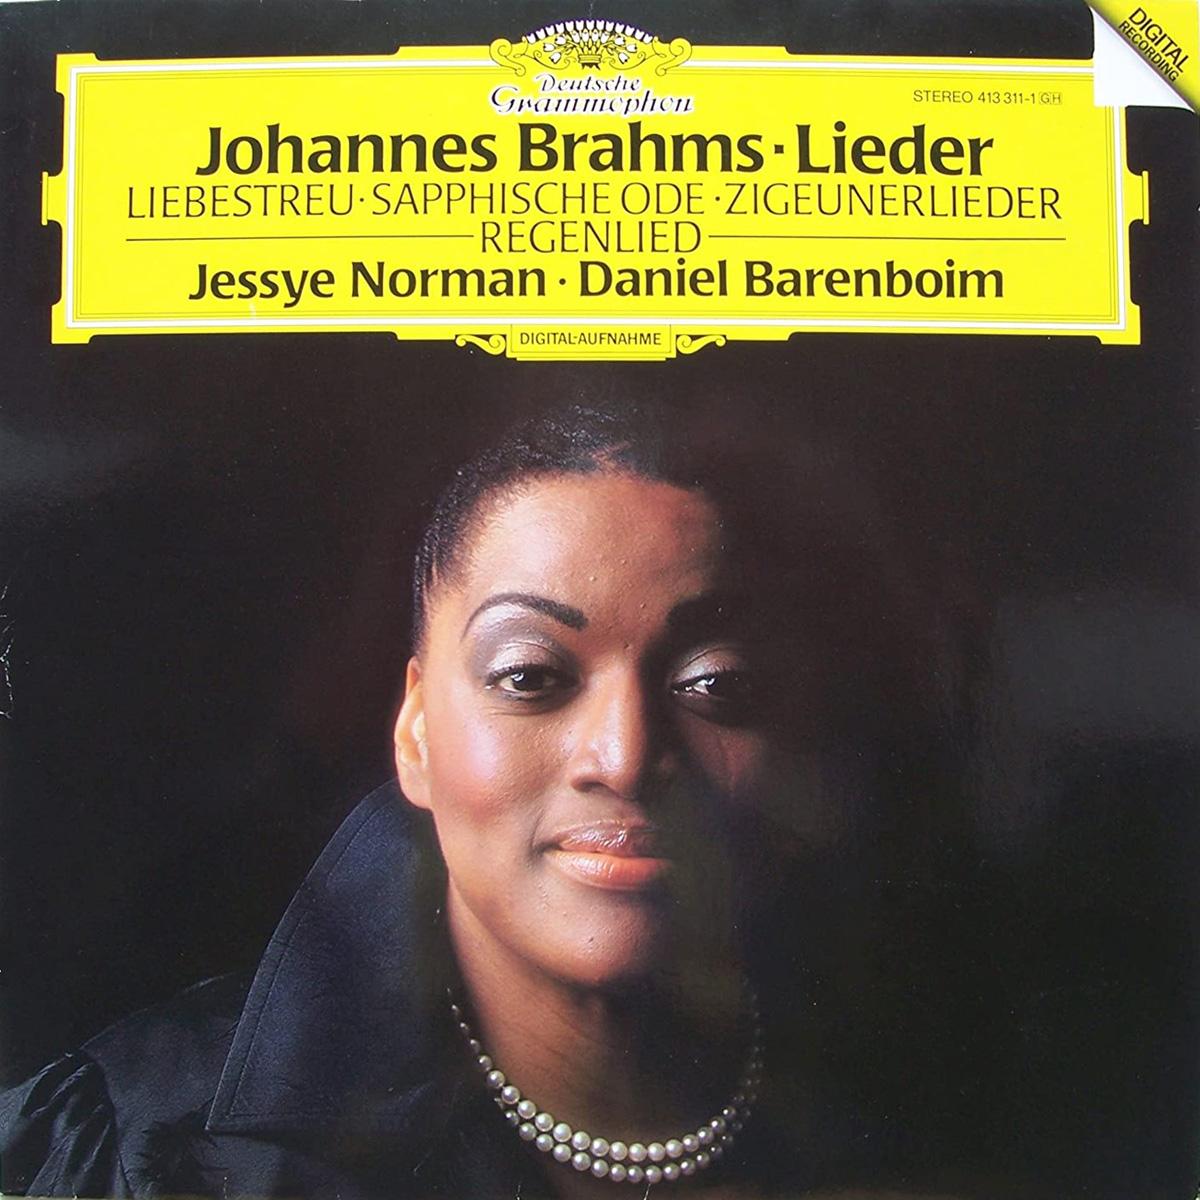 DGG 413 311 Brahms Lieder Norman Barenboim DGG Digital Aufnahme